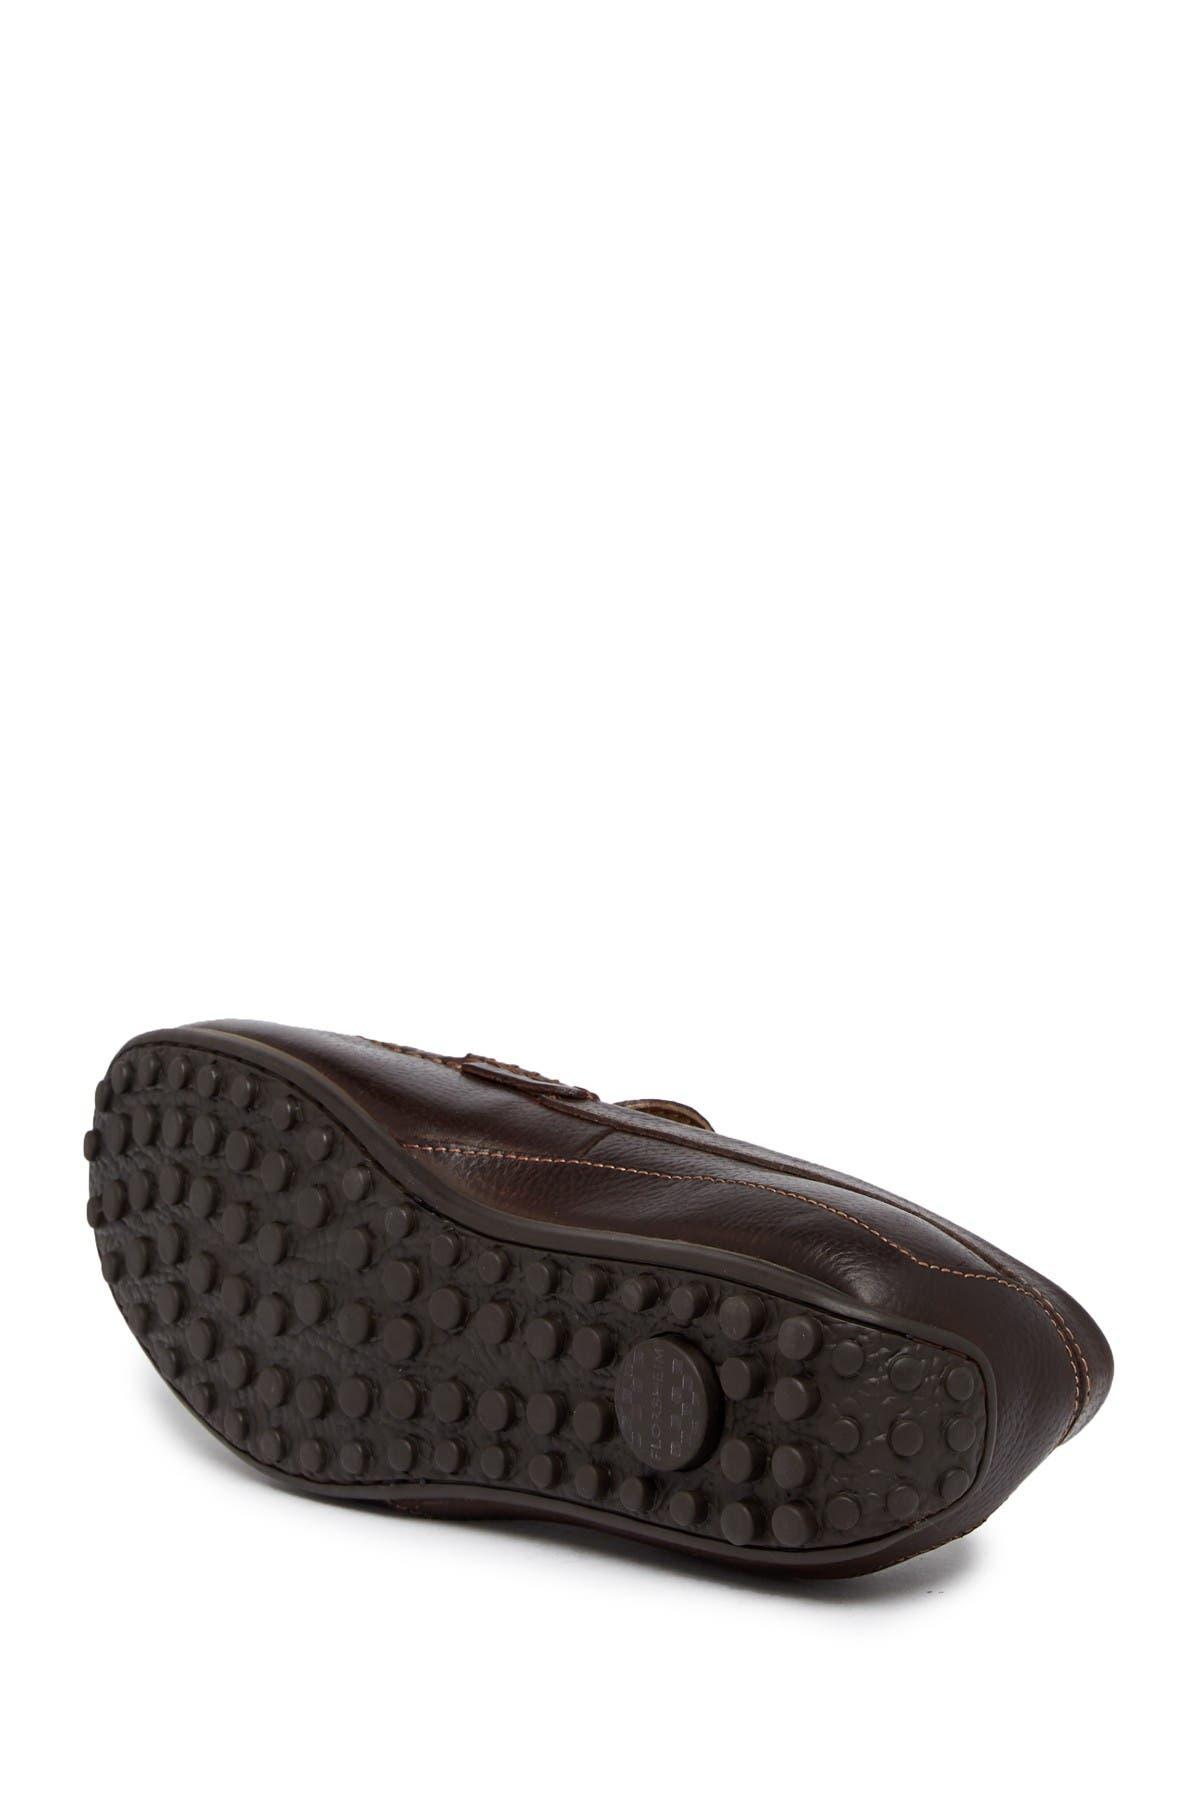 Florsheim Throttle Leather Penny Loafer